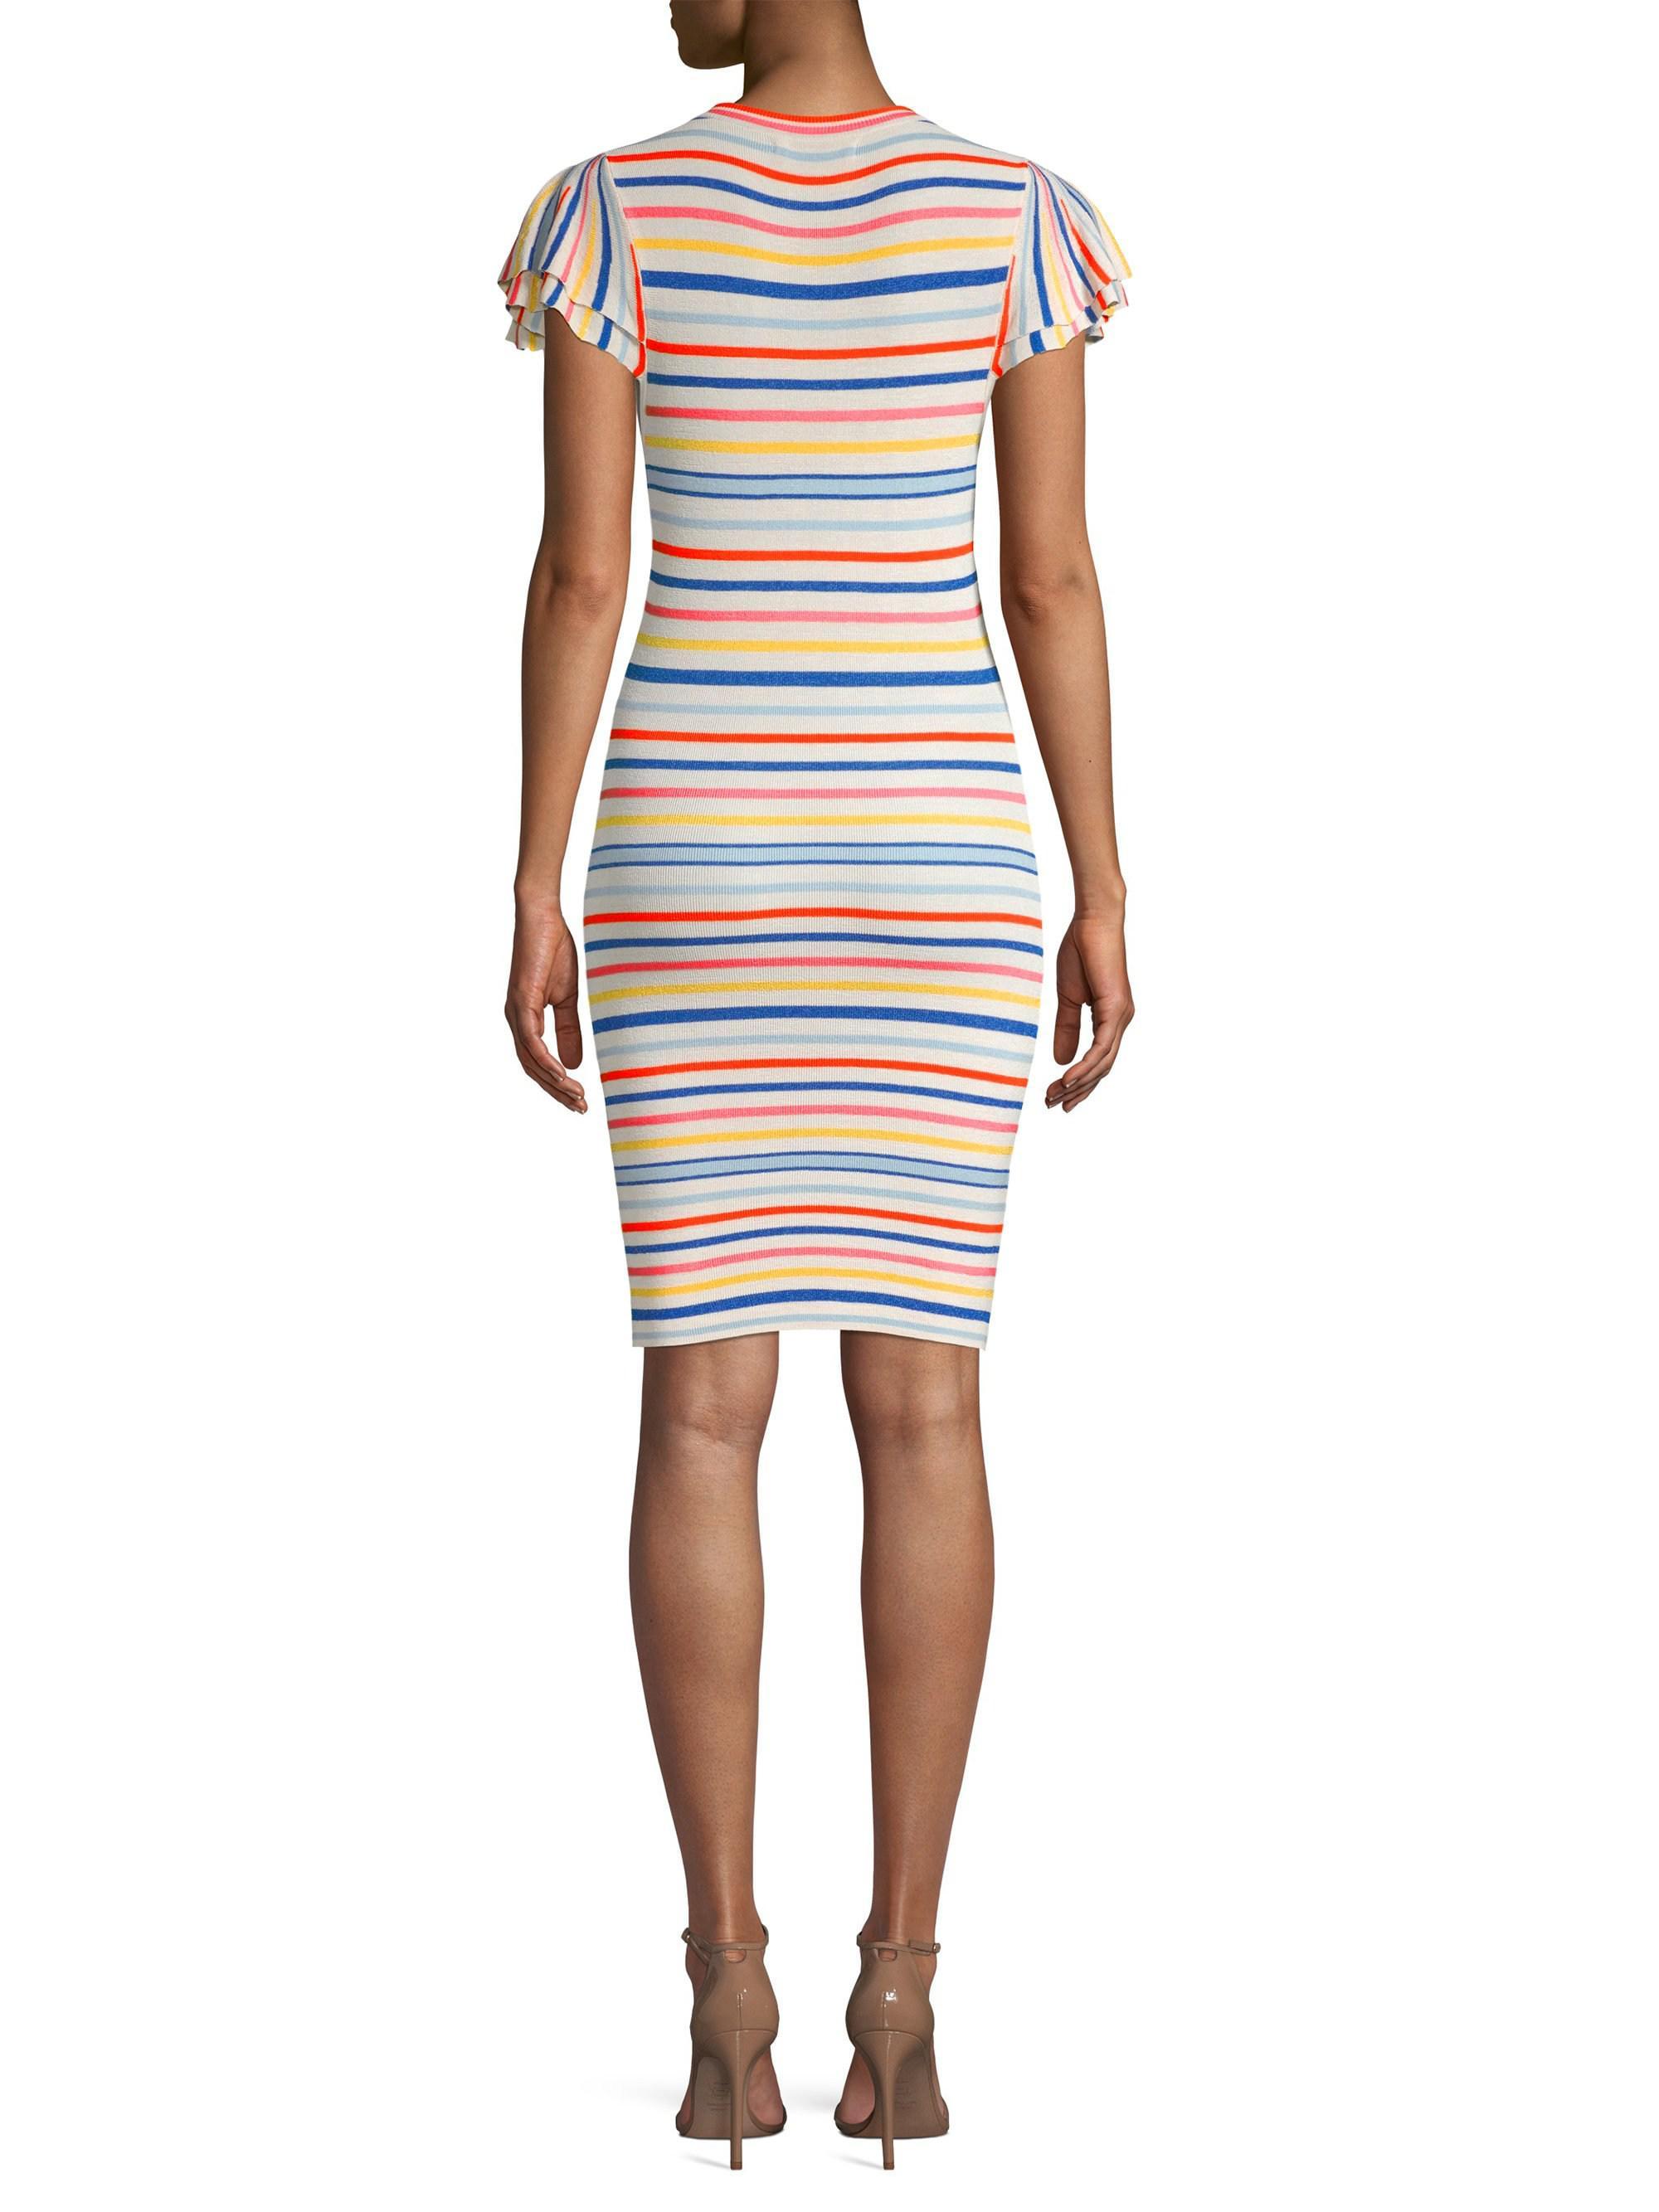 5f605fbee92 Lyst - Alice + Olivia Kellin Striped Tee Dress